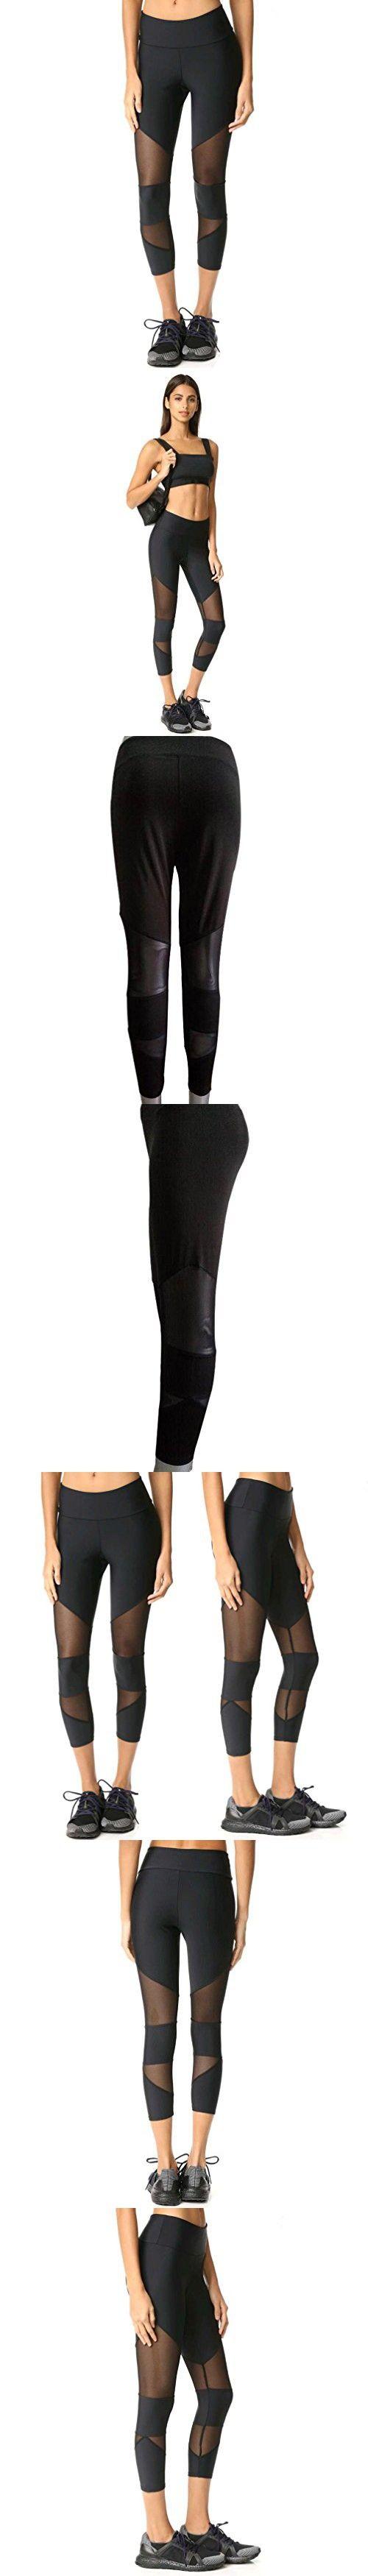 Women Skinny Leggings, Keepfit Patchwork Mesh Yoga Pants Fitness Sports Tights (M)